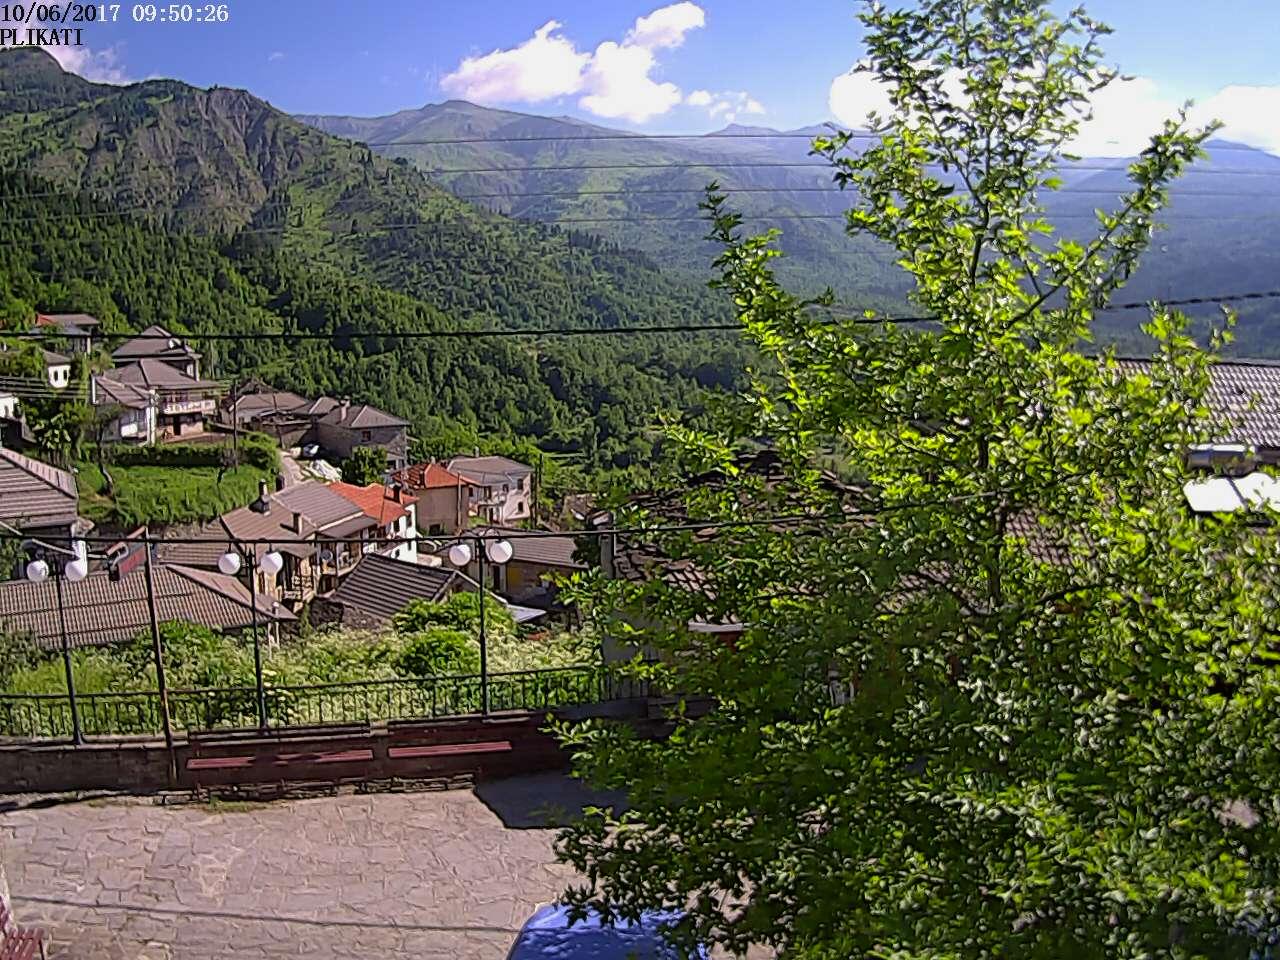 Webcam Πληκάτι Ιωαννίνων 2 (2520μ υψόμετρο)